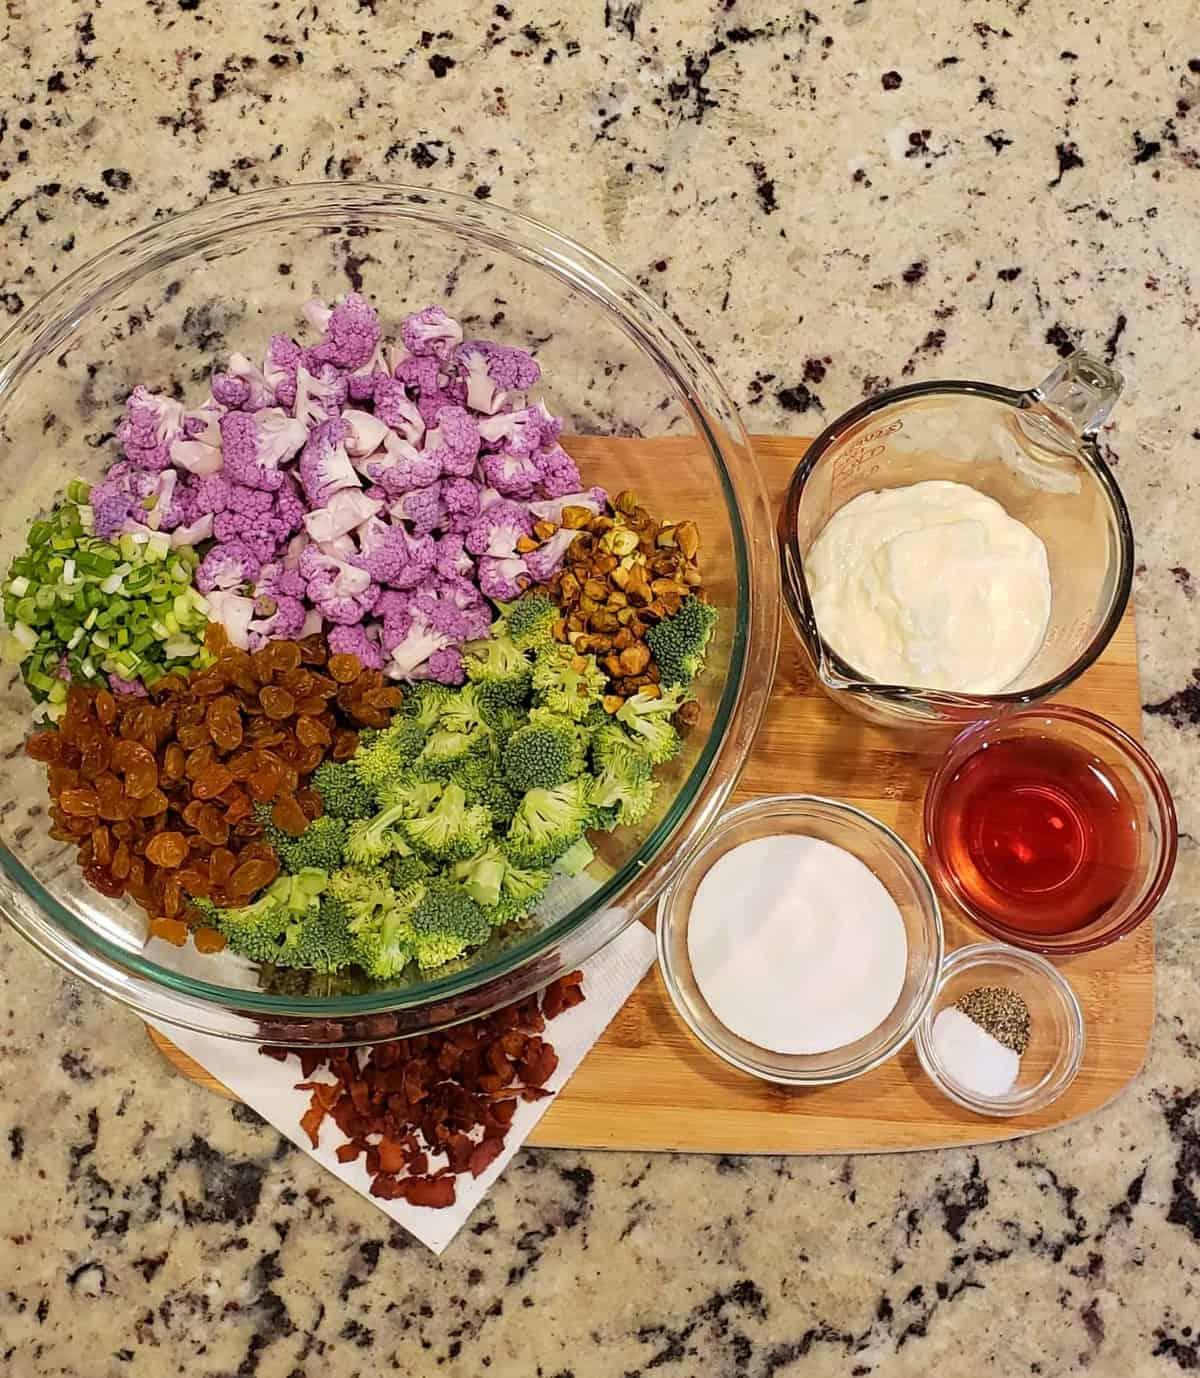 Ingredients in a glass bowl red wine vinegar, Dukes mayonnaise, green onion, golden raisins, bacon, broccoli, purple cauliflower